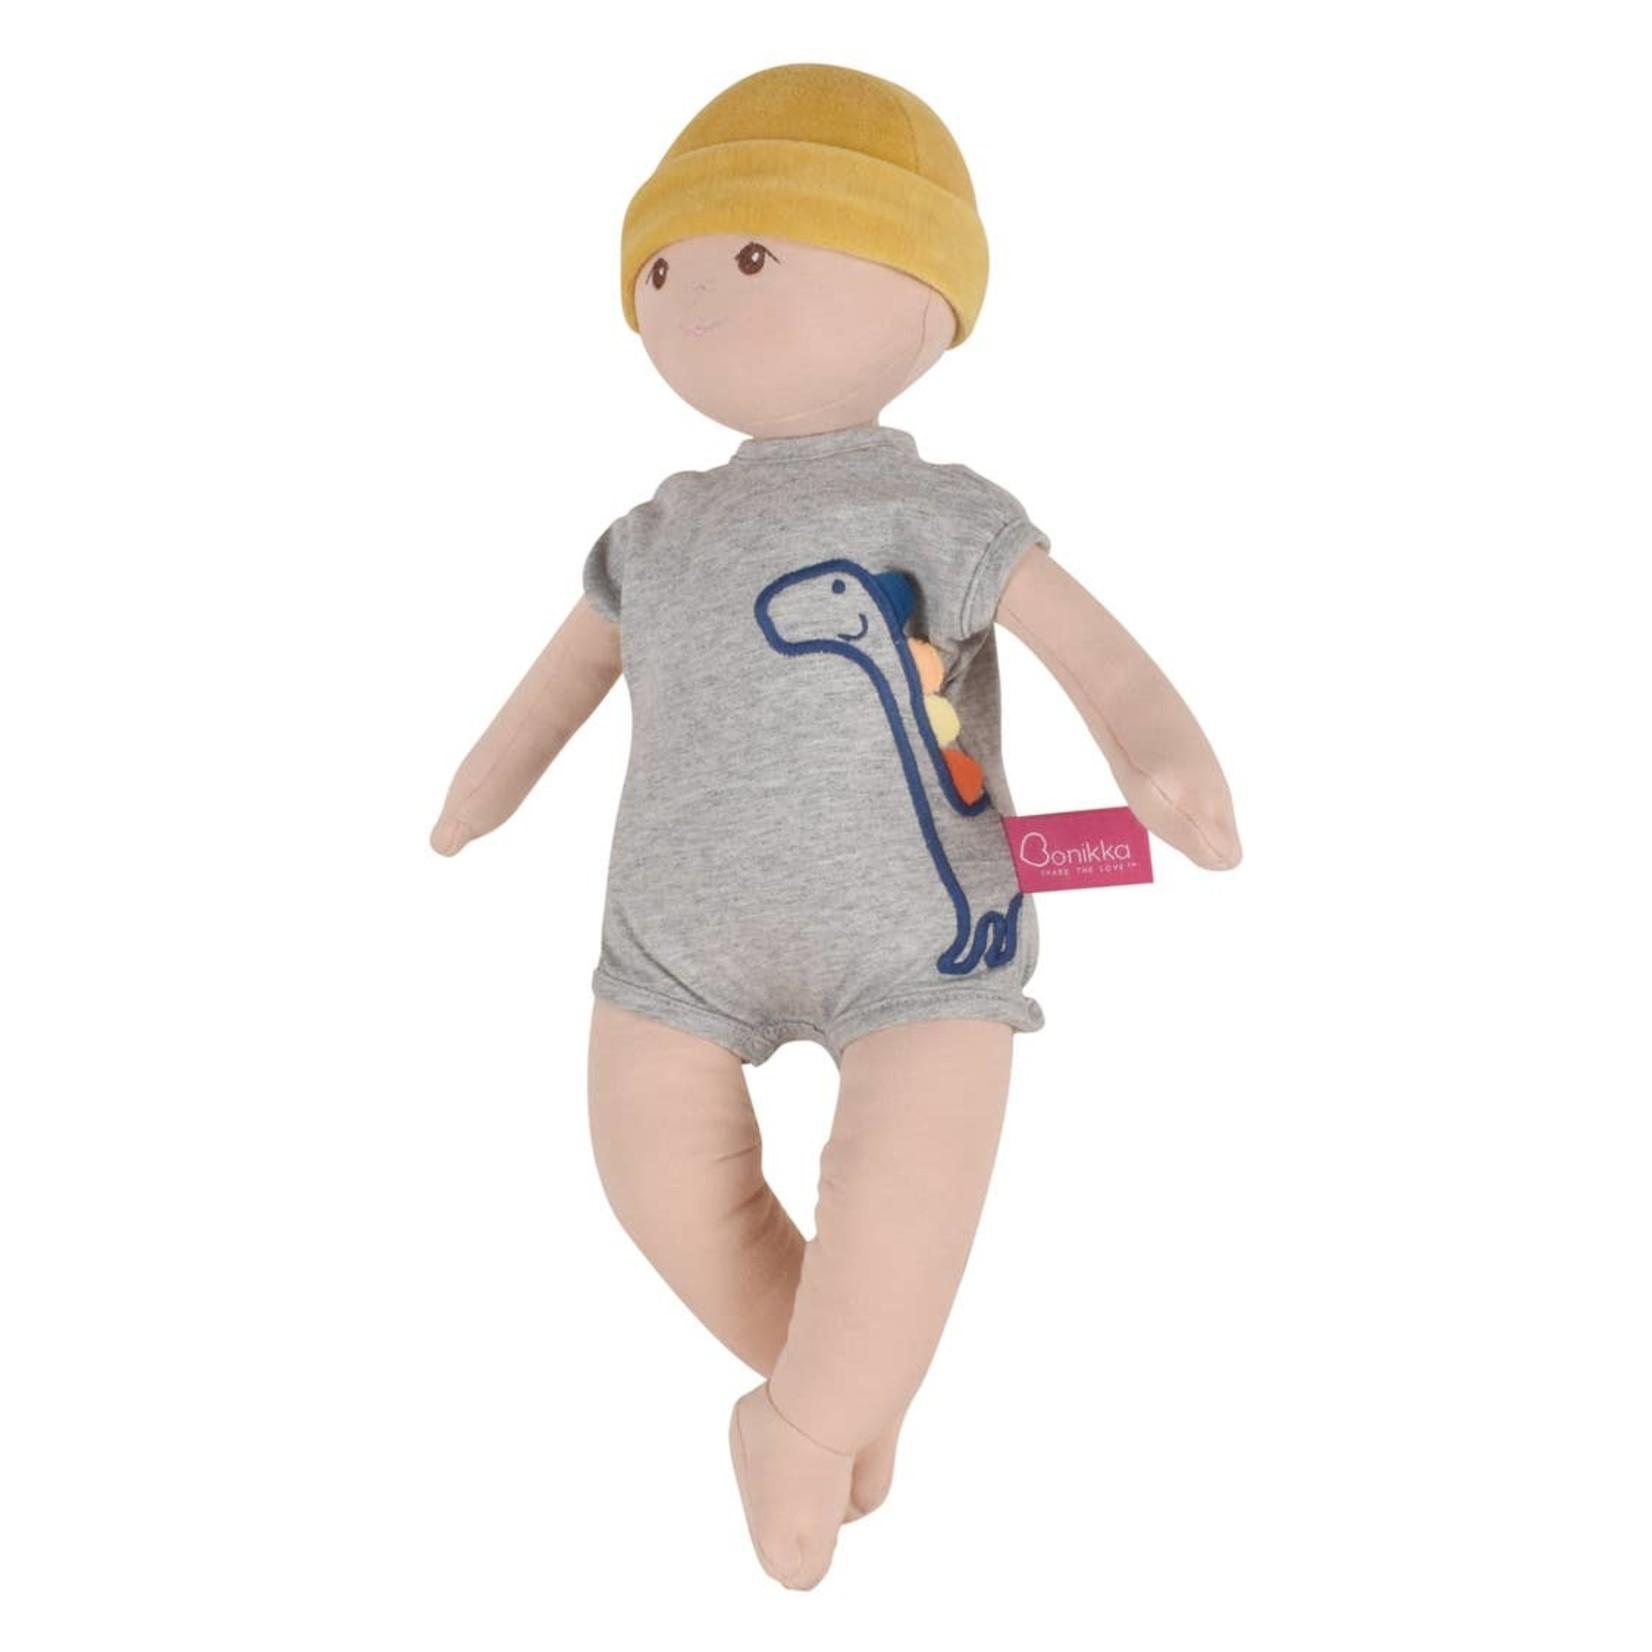 Tikiri Toys Baby Kye Organic Doll